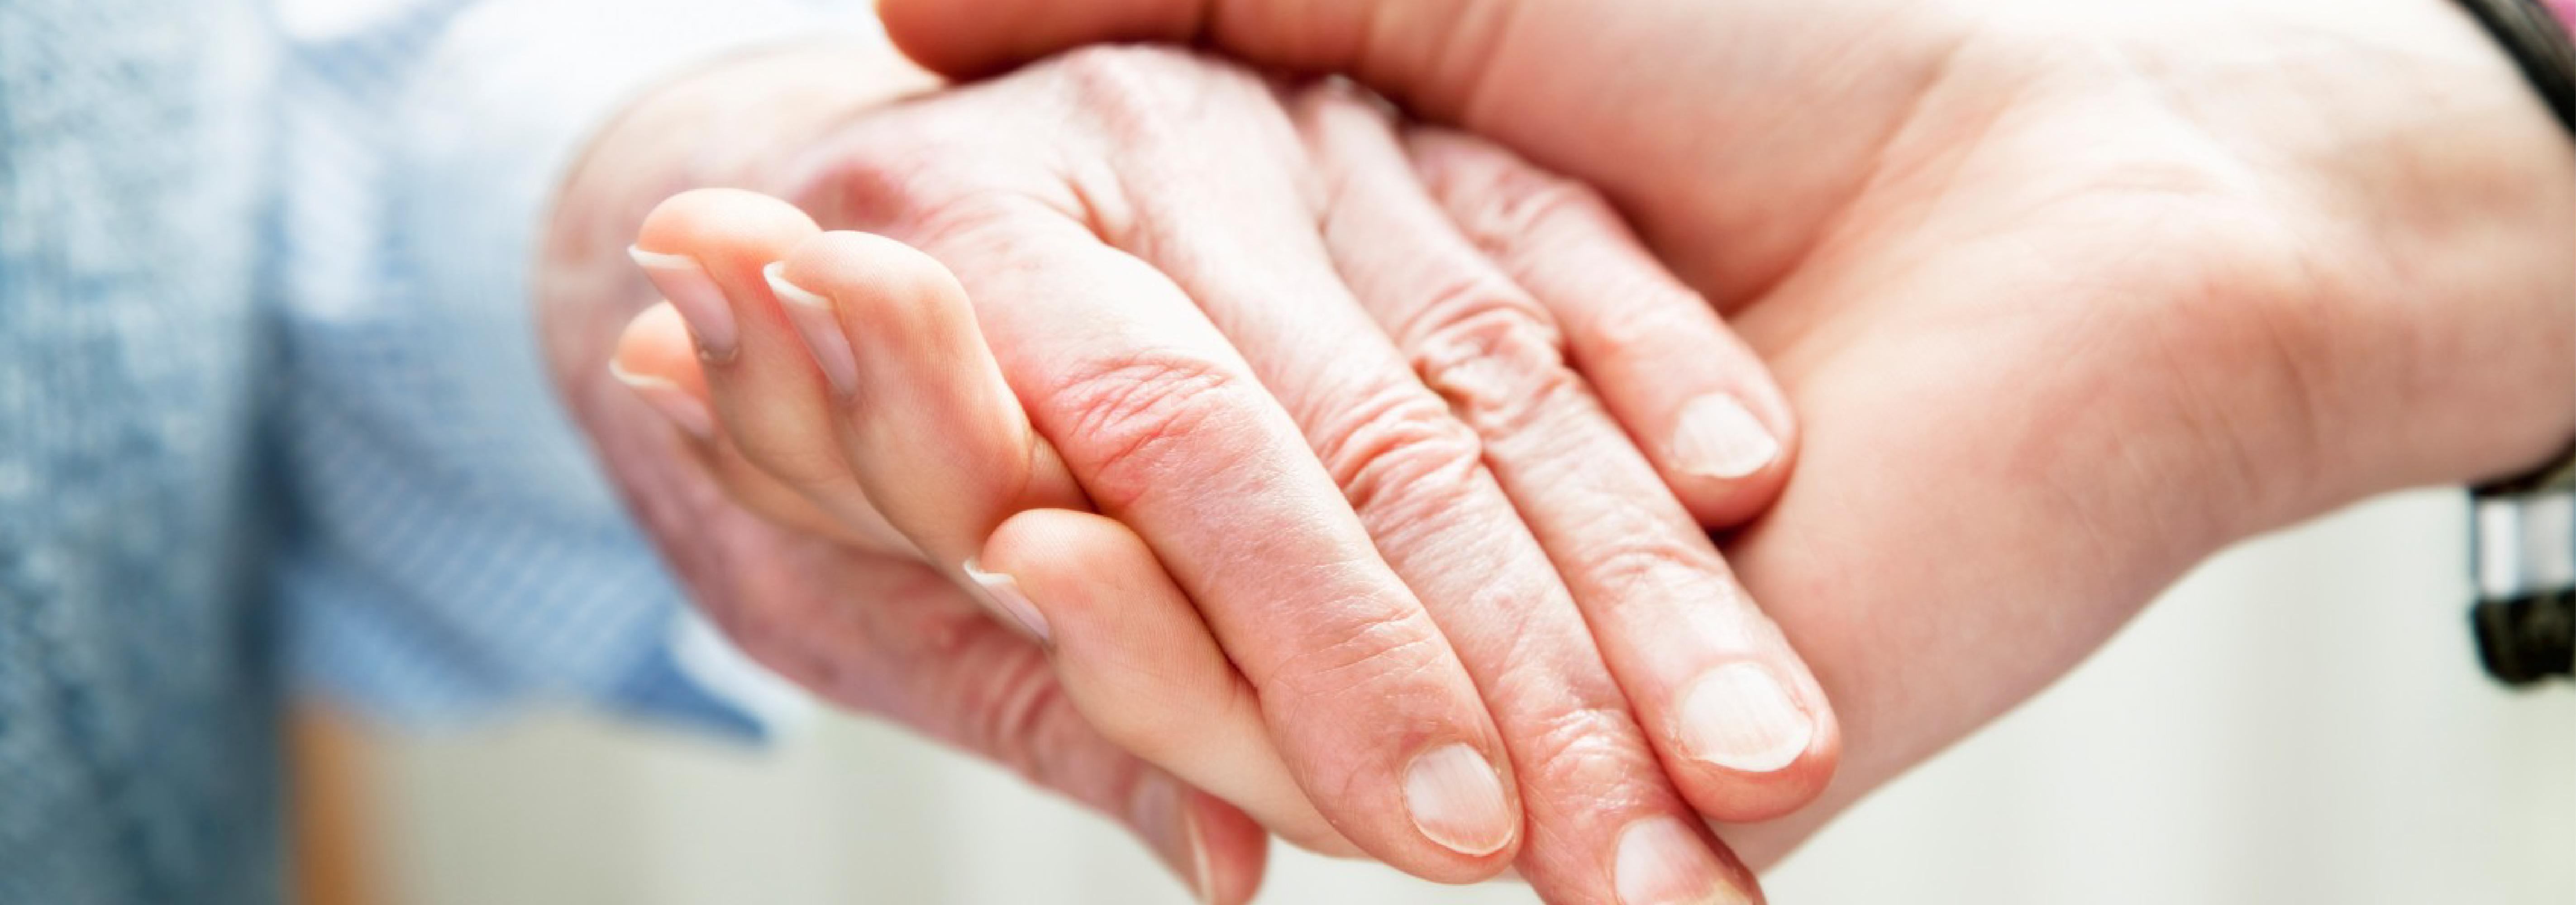 Elderly Care Services at Home, Caretakers, Nurses Near Me